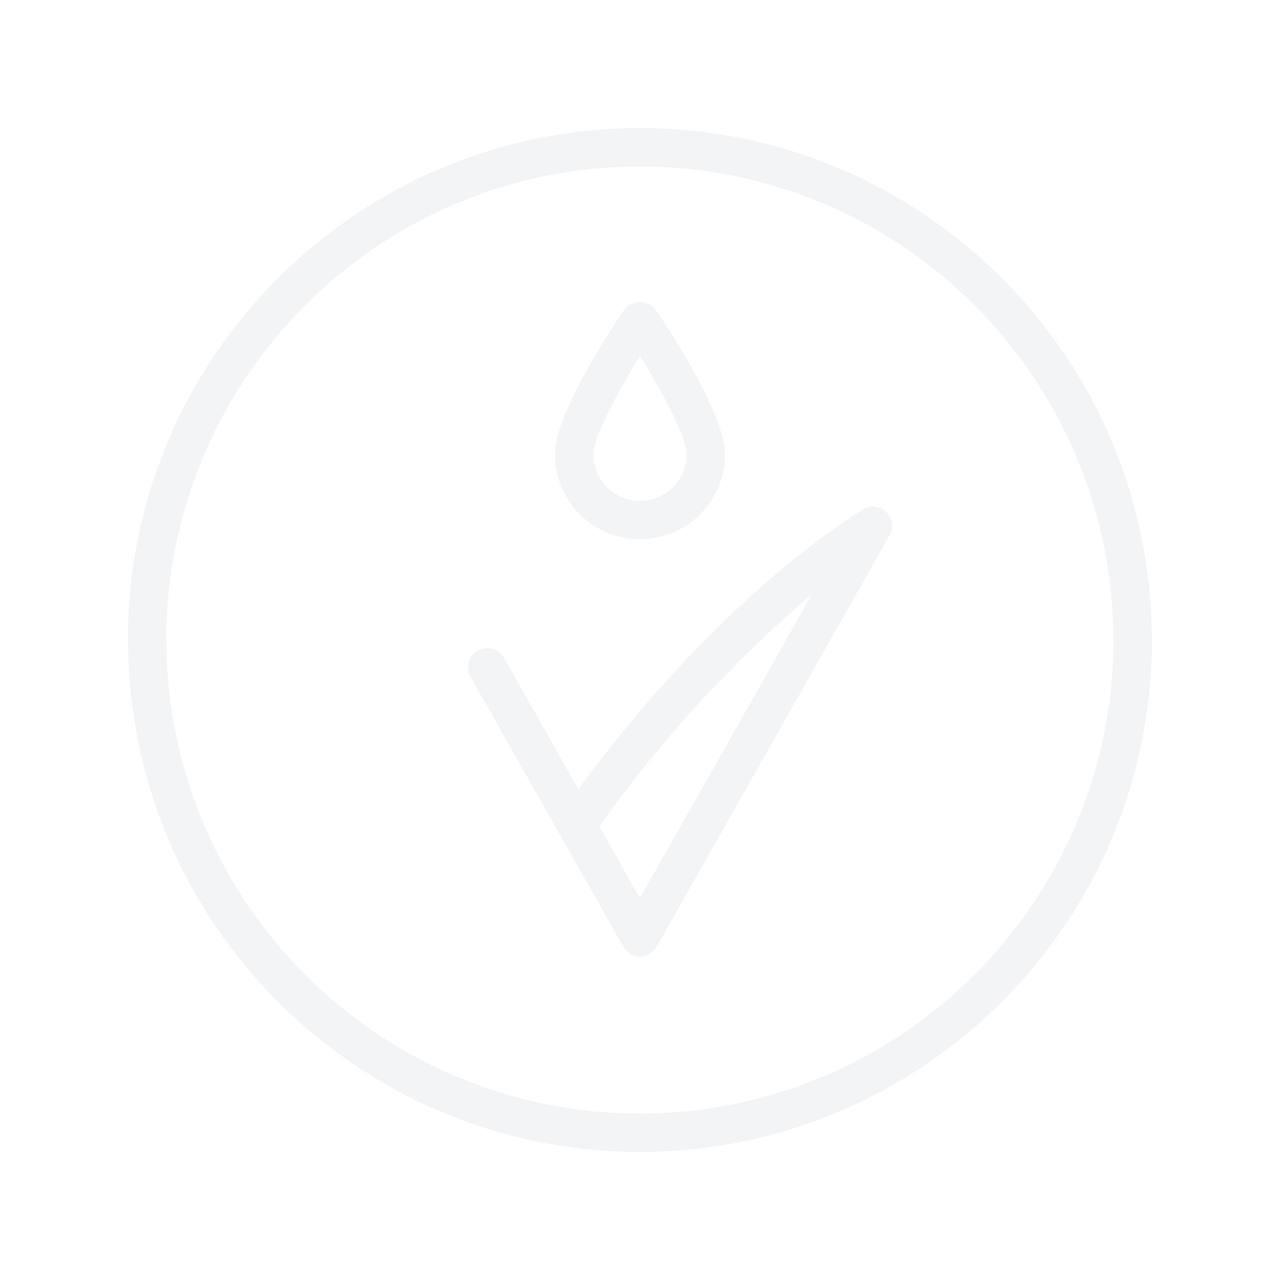 ORGANIC SHOP Camellia & 5 Oils Body Cream 250ml